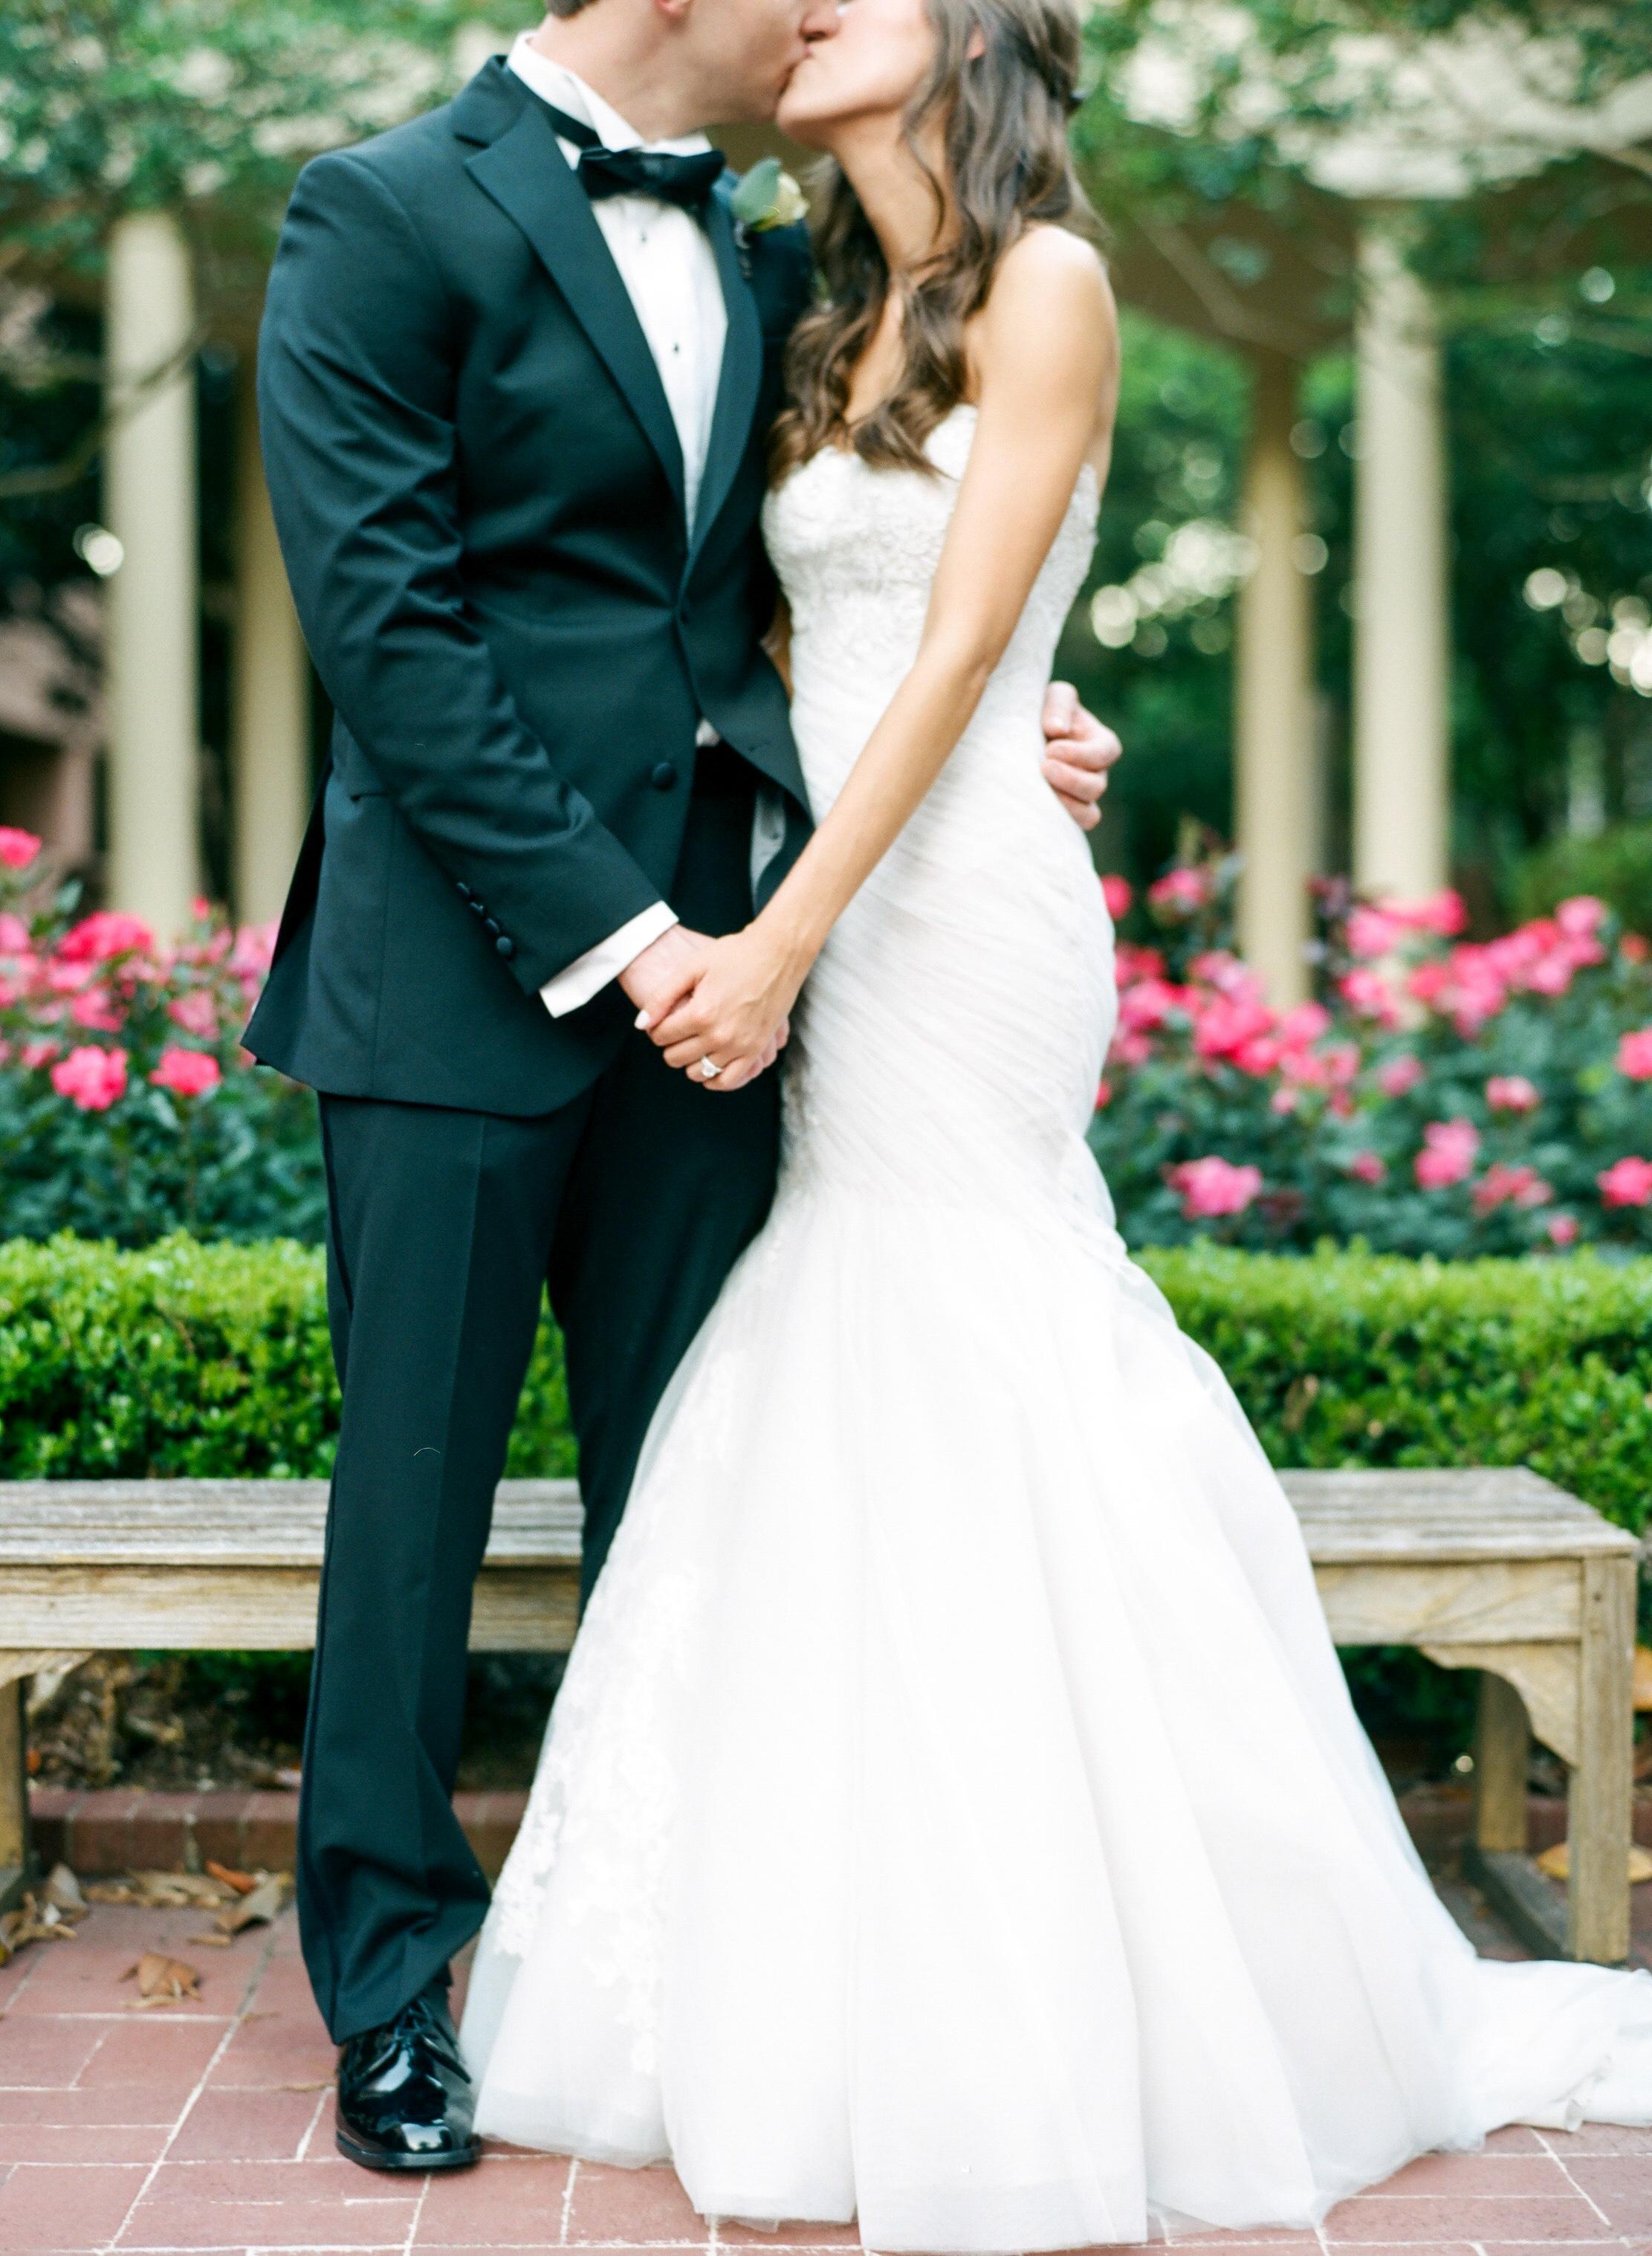 St.-Philip-Presbyterian-Church-Houston-Wedding-Ceremony-The-Junior-League-Of-Houston-Reception-Dana-Fernandez-Photography-Fine-Art-Film-19.jpg